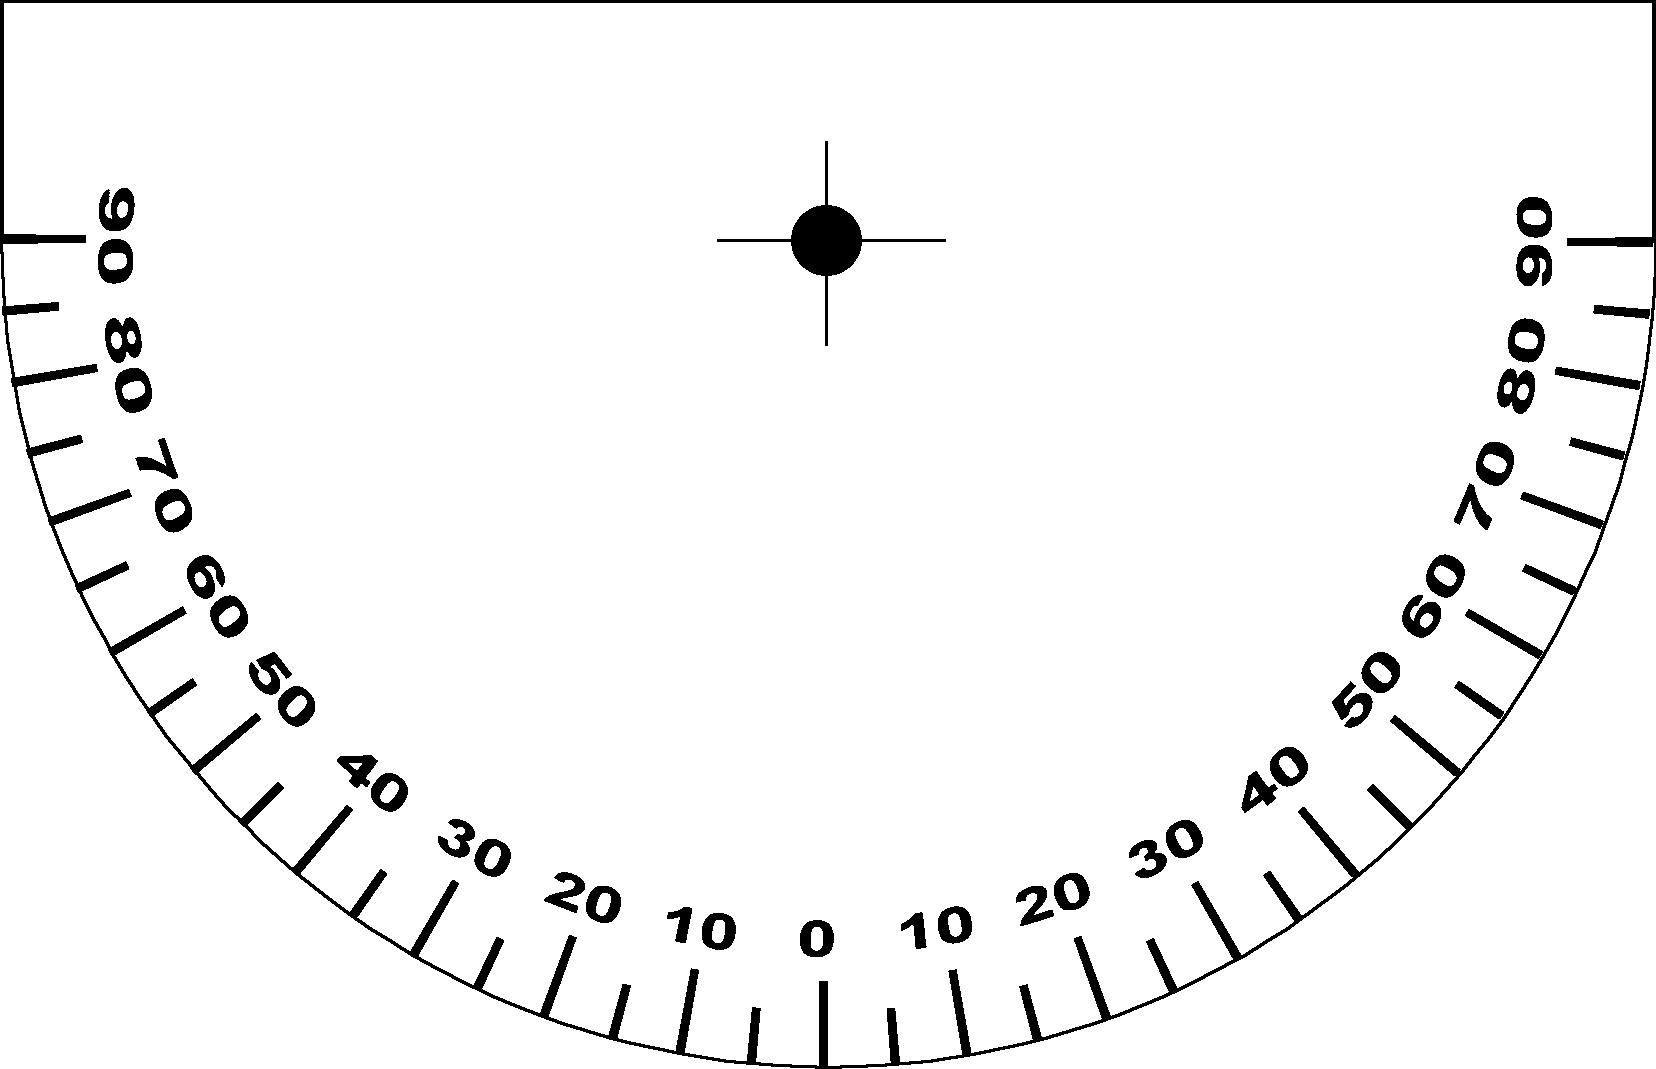 Рисование Шкалы Программа